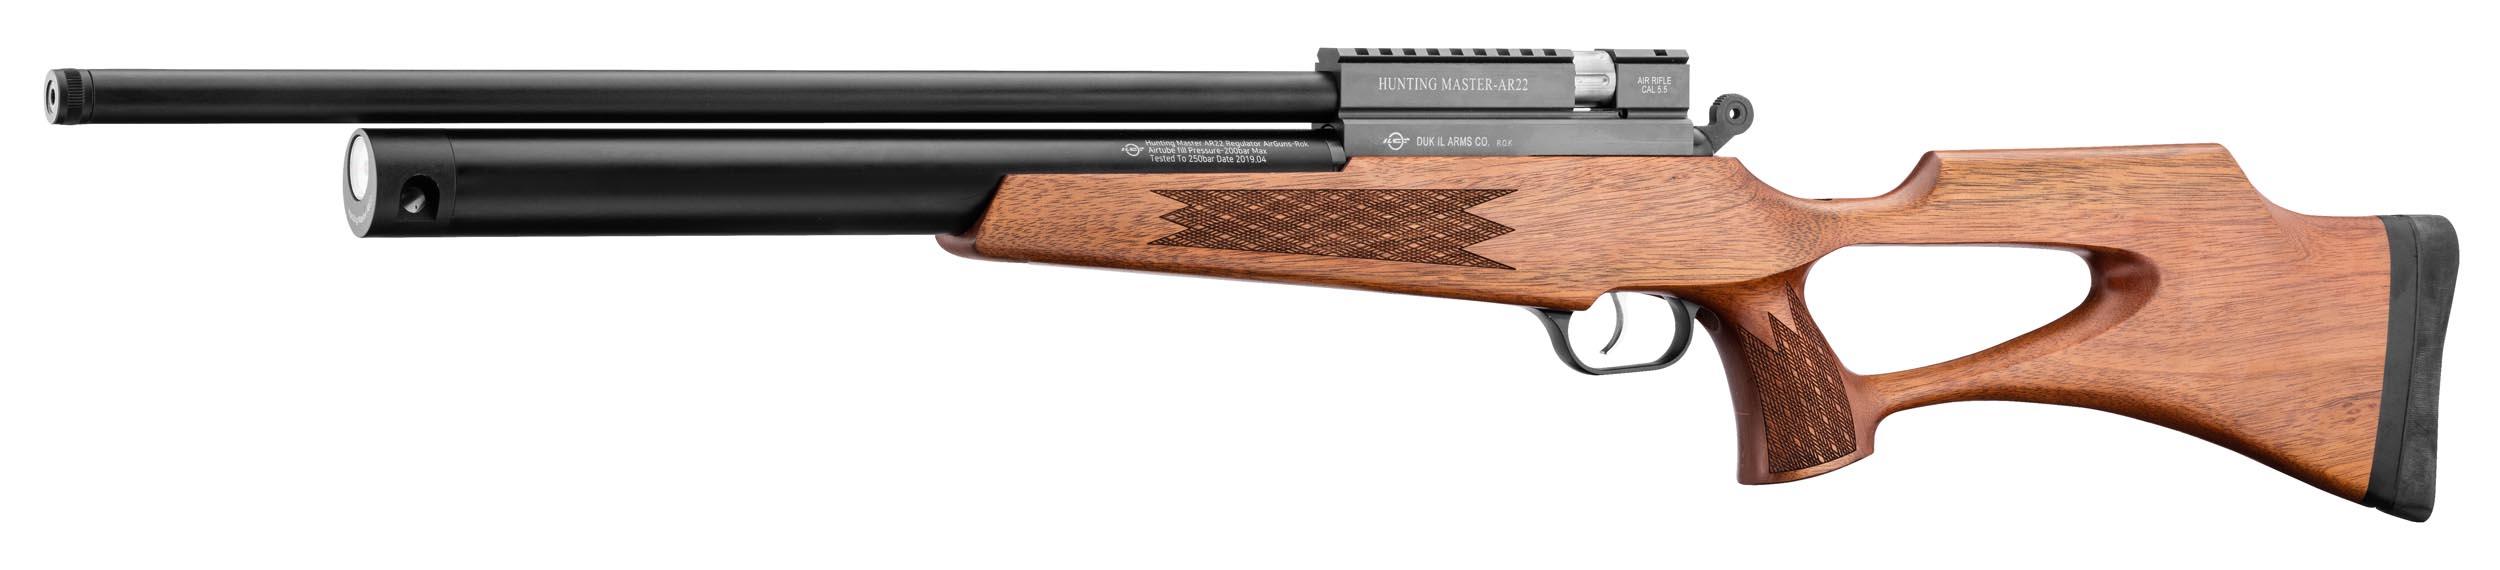 Evanix PCP AR22 Wood 5.5 mm  (RESERVA)